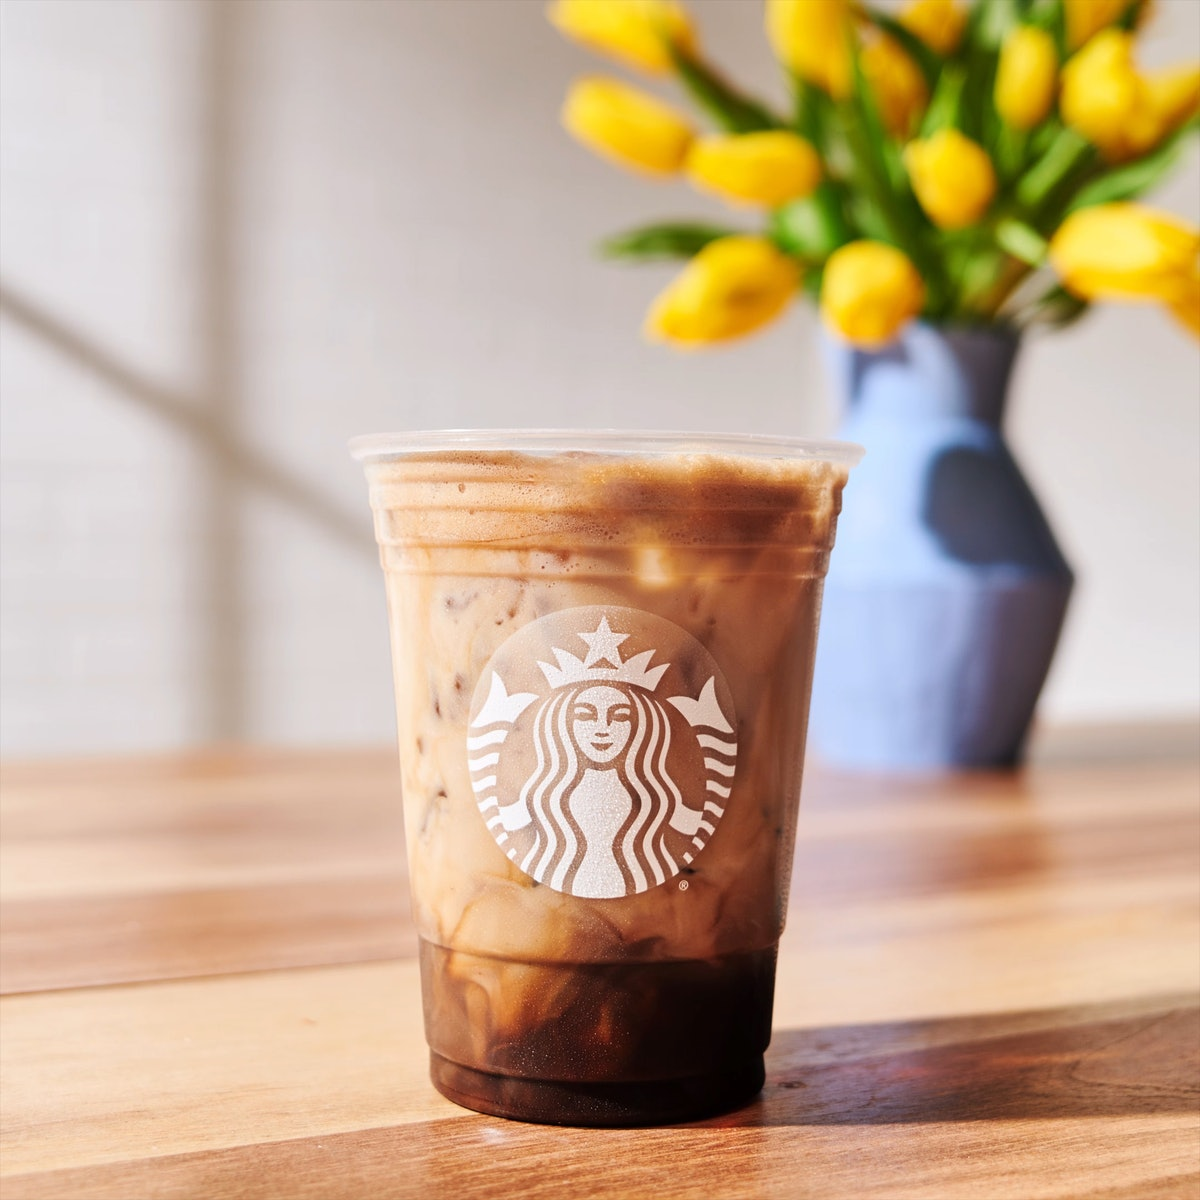 Starbucks' Iced Shaken Espresso drink lineup is a twist on a classic latte.